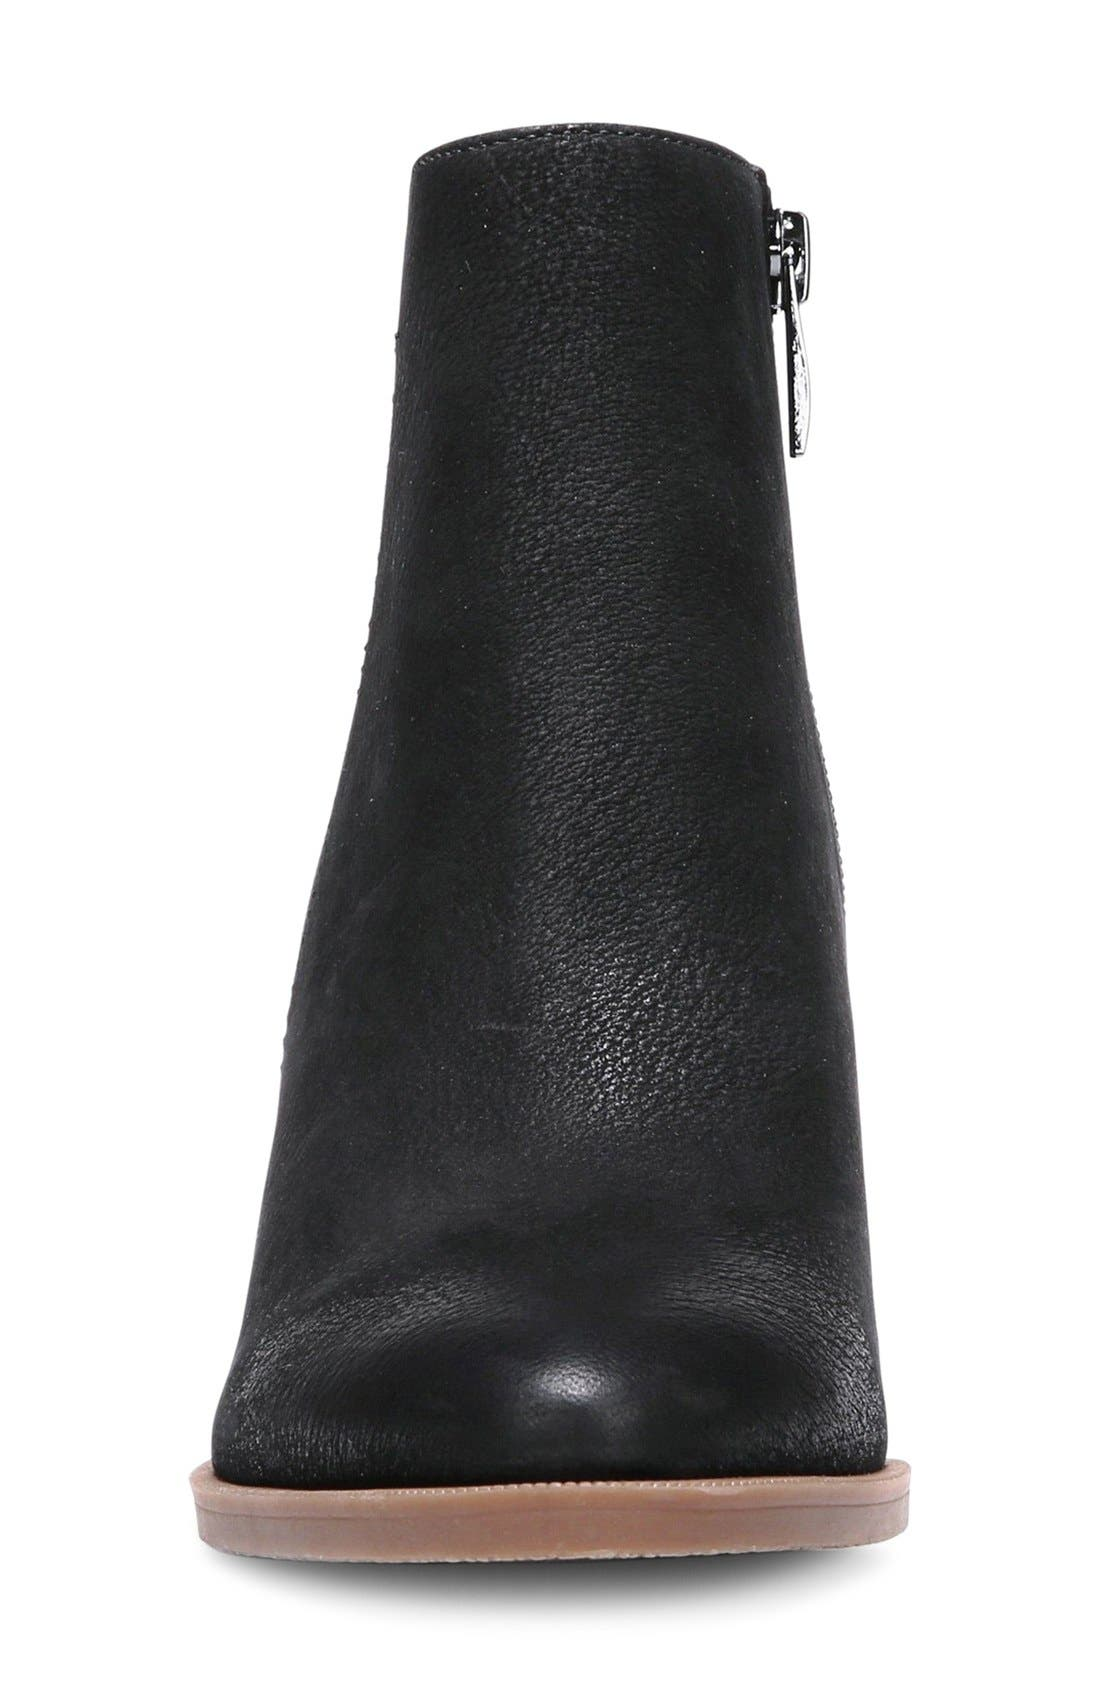 FRANCO SARTO, 'Dipali' Block Heel Bootie, Alternate thumbnail 3, color, 001